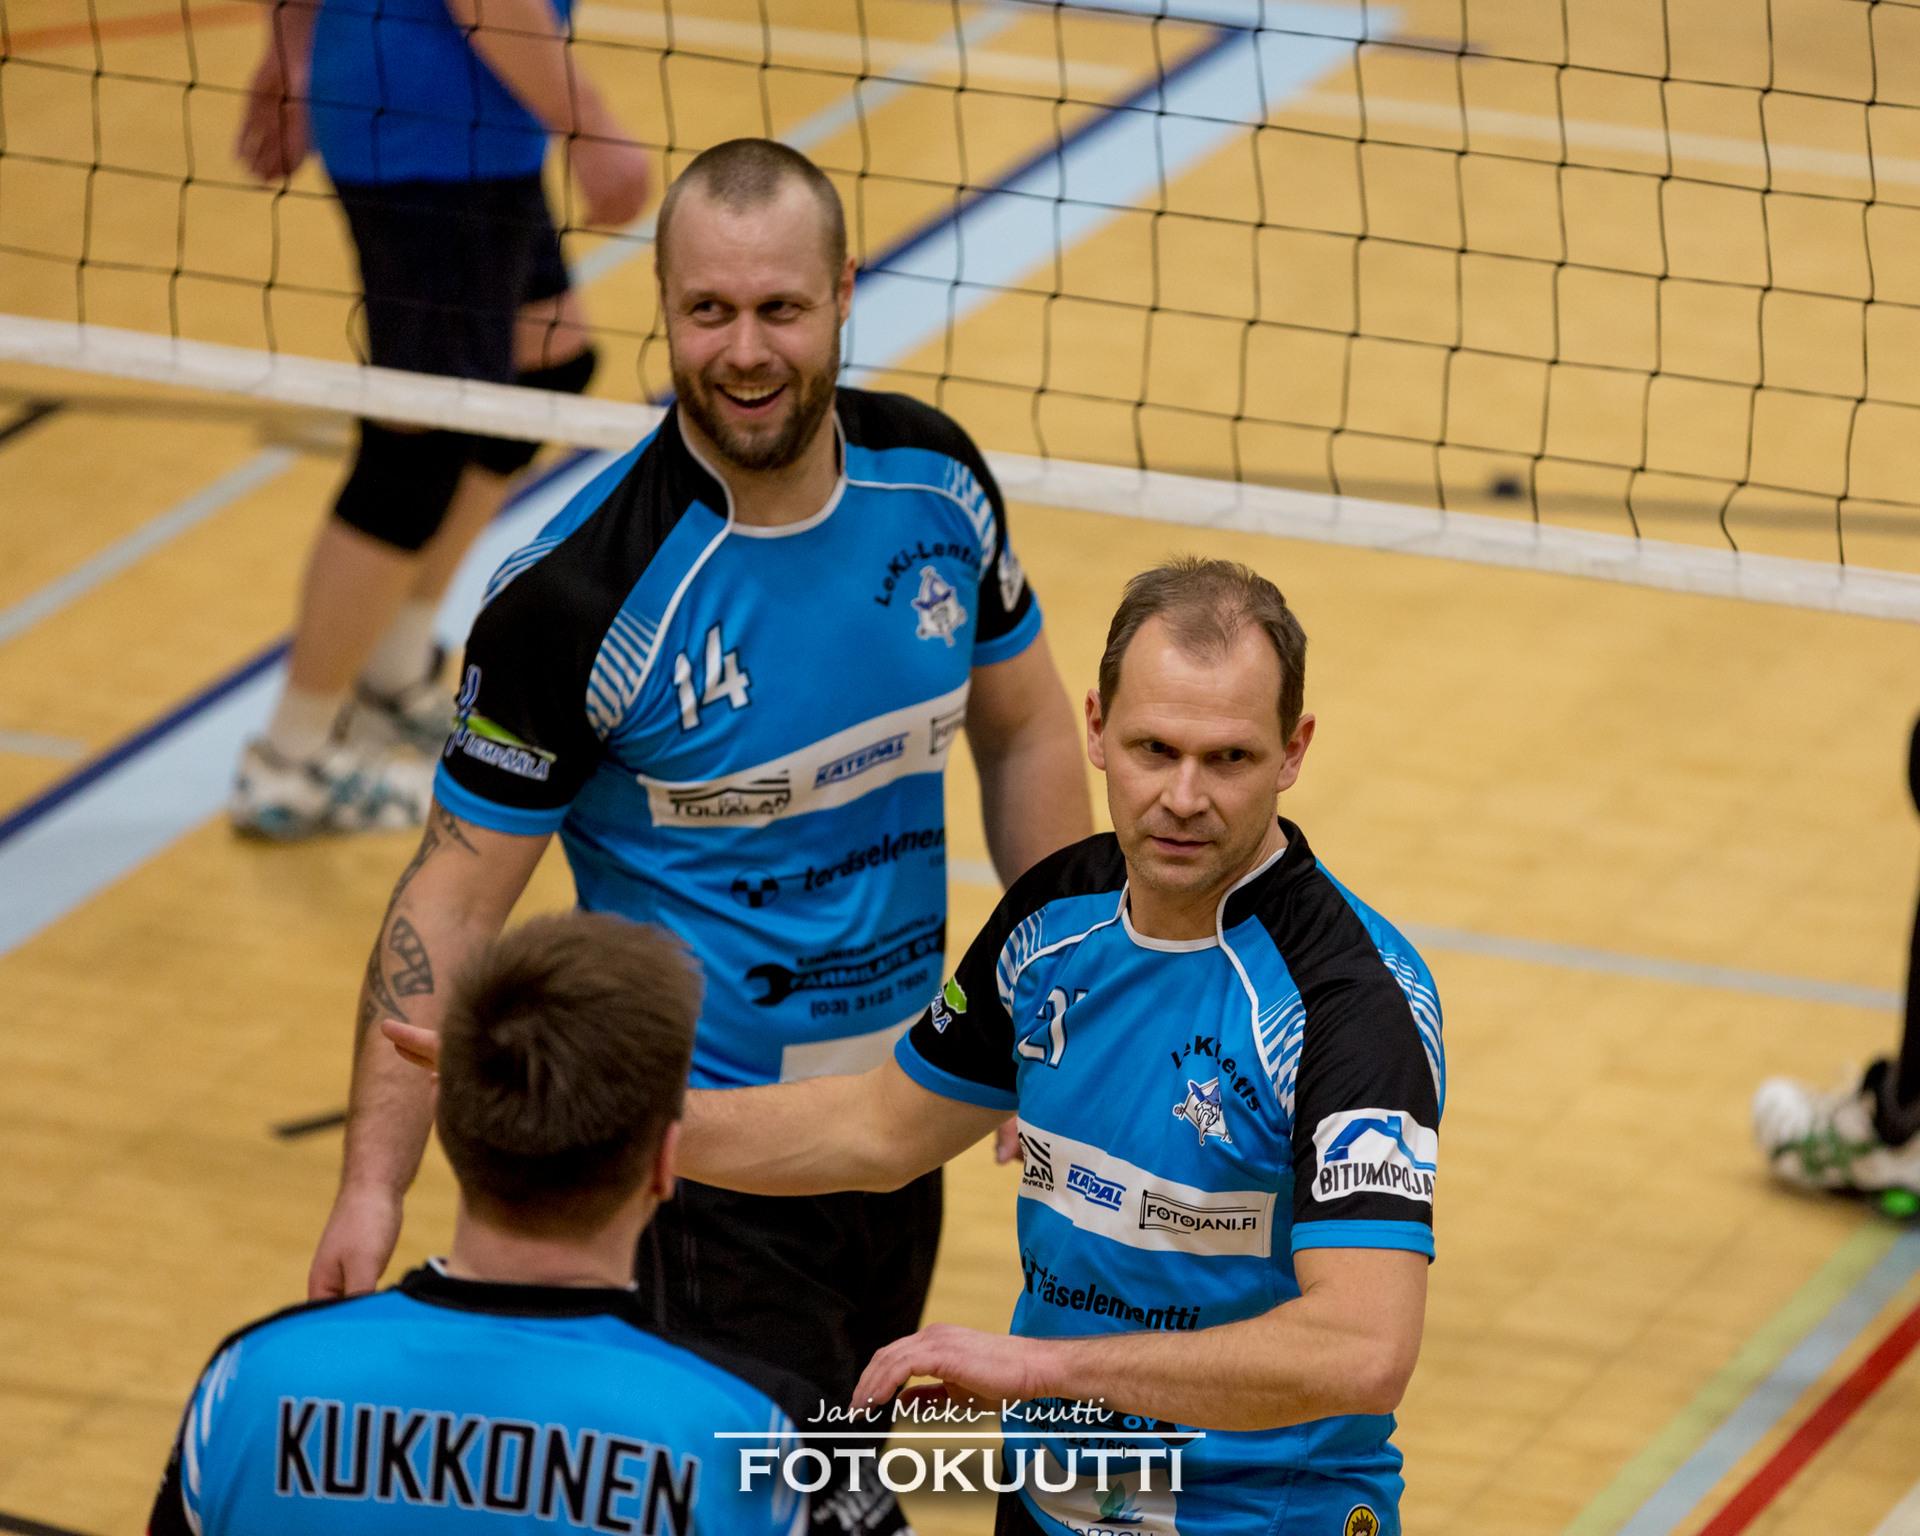 Kuva: Jari Mäki-Kuutti